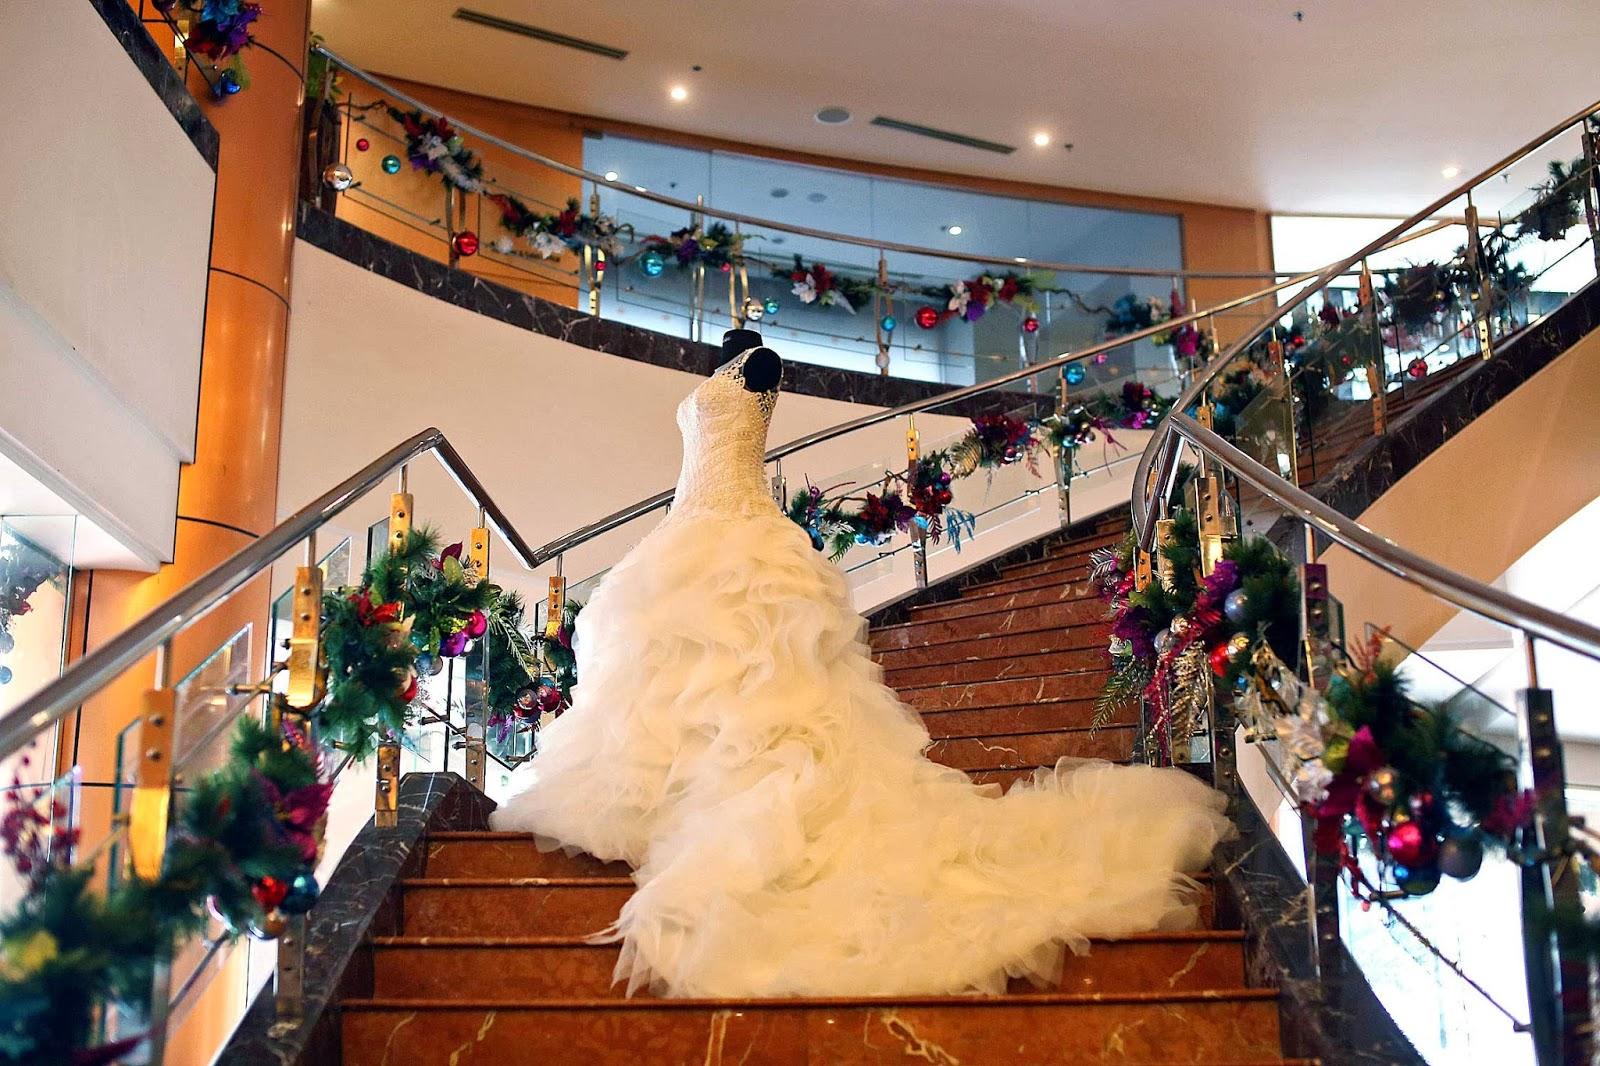 Dressing Place At Richmonde Hotel Eastwood Qc Wedding Fernwood Garden Cycad Reception To Be Followed C All Photos